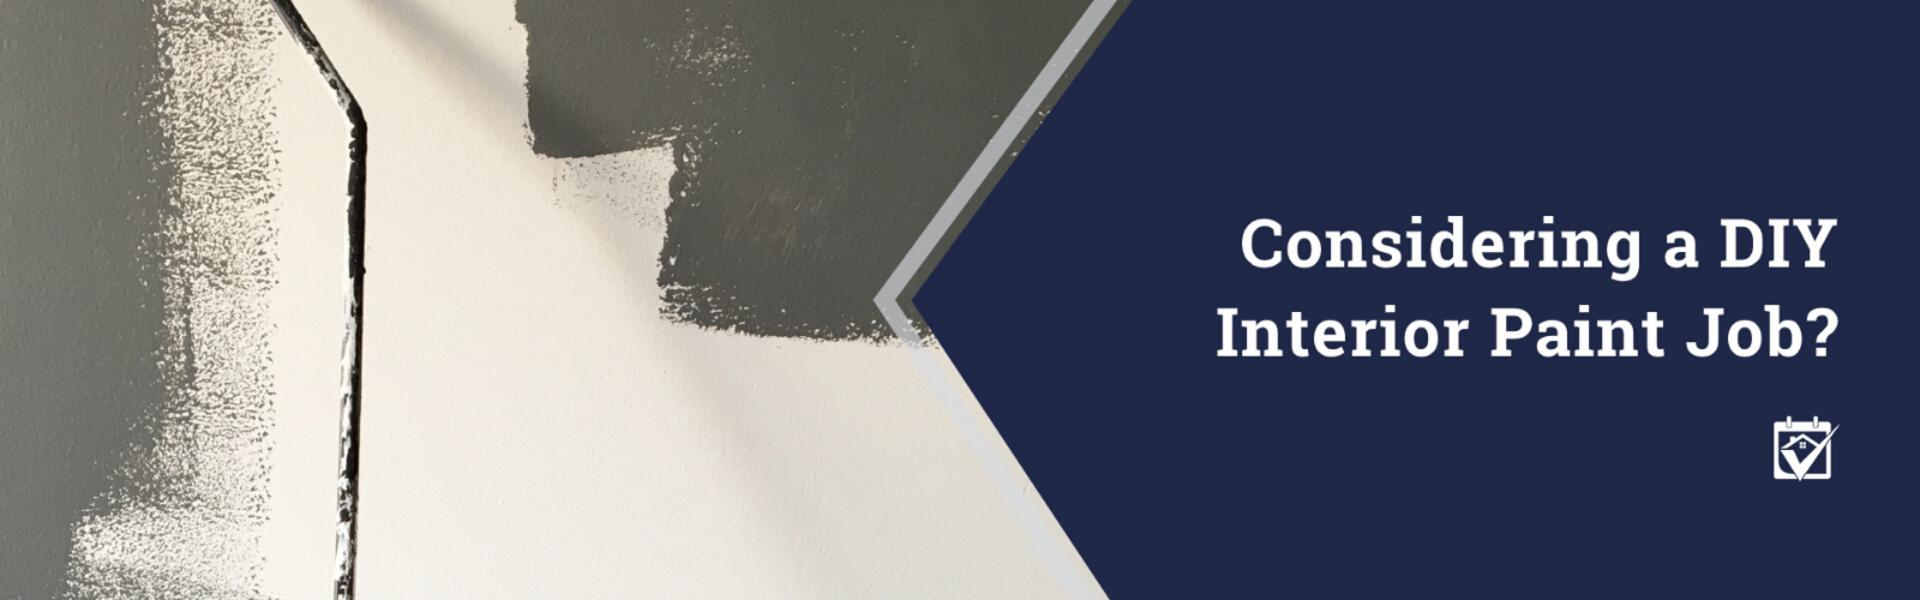 Considering a DIY Interior Paint Job?